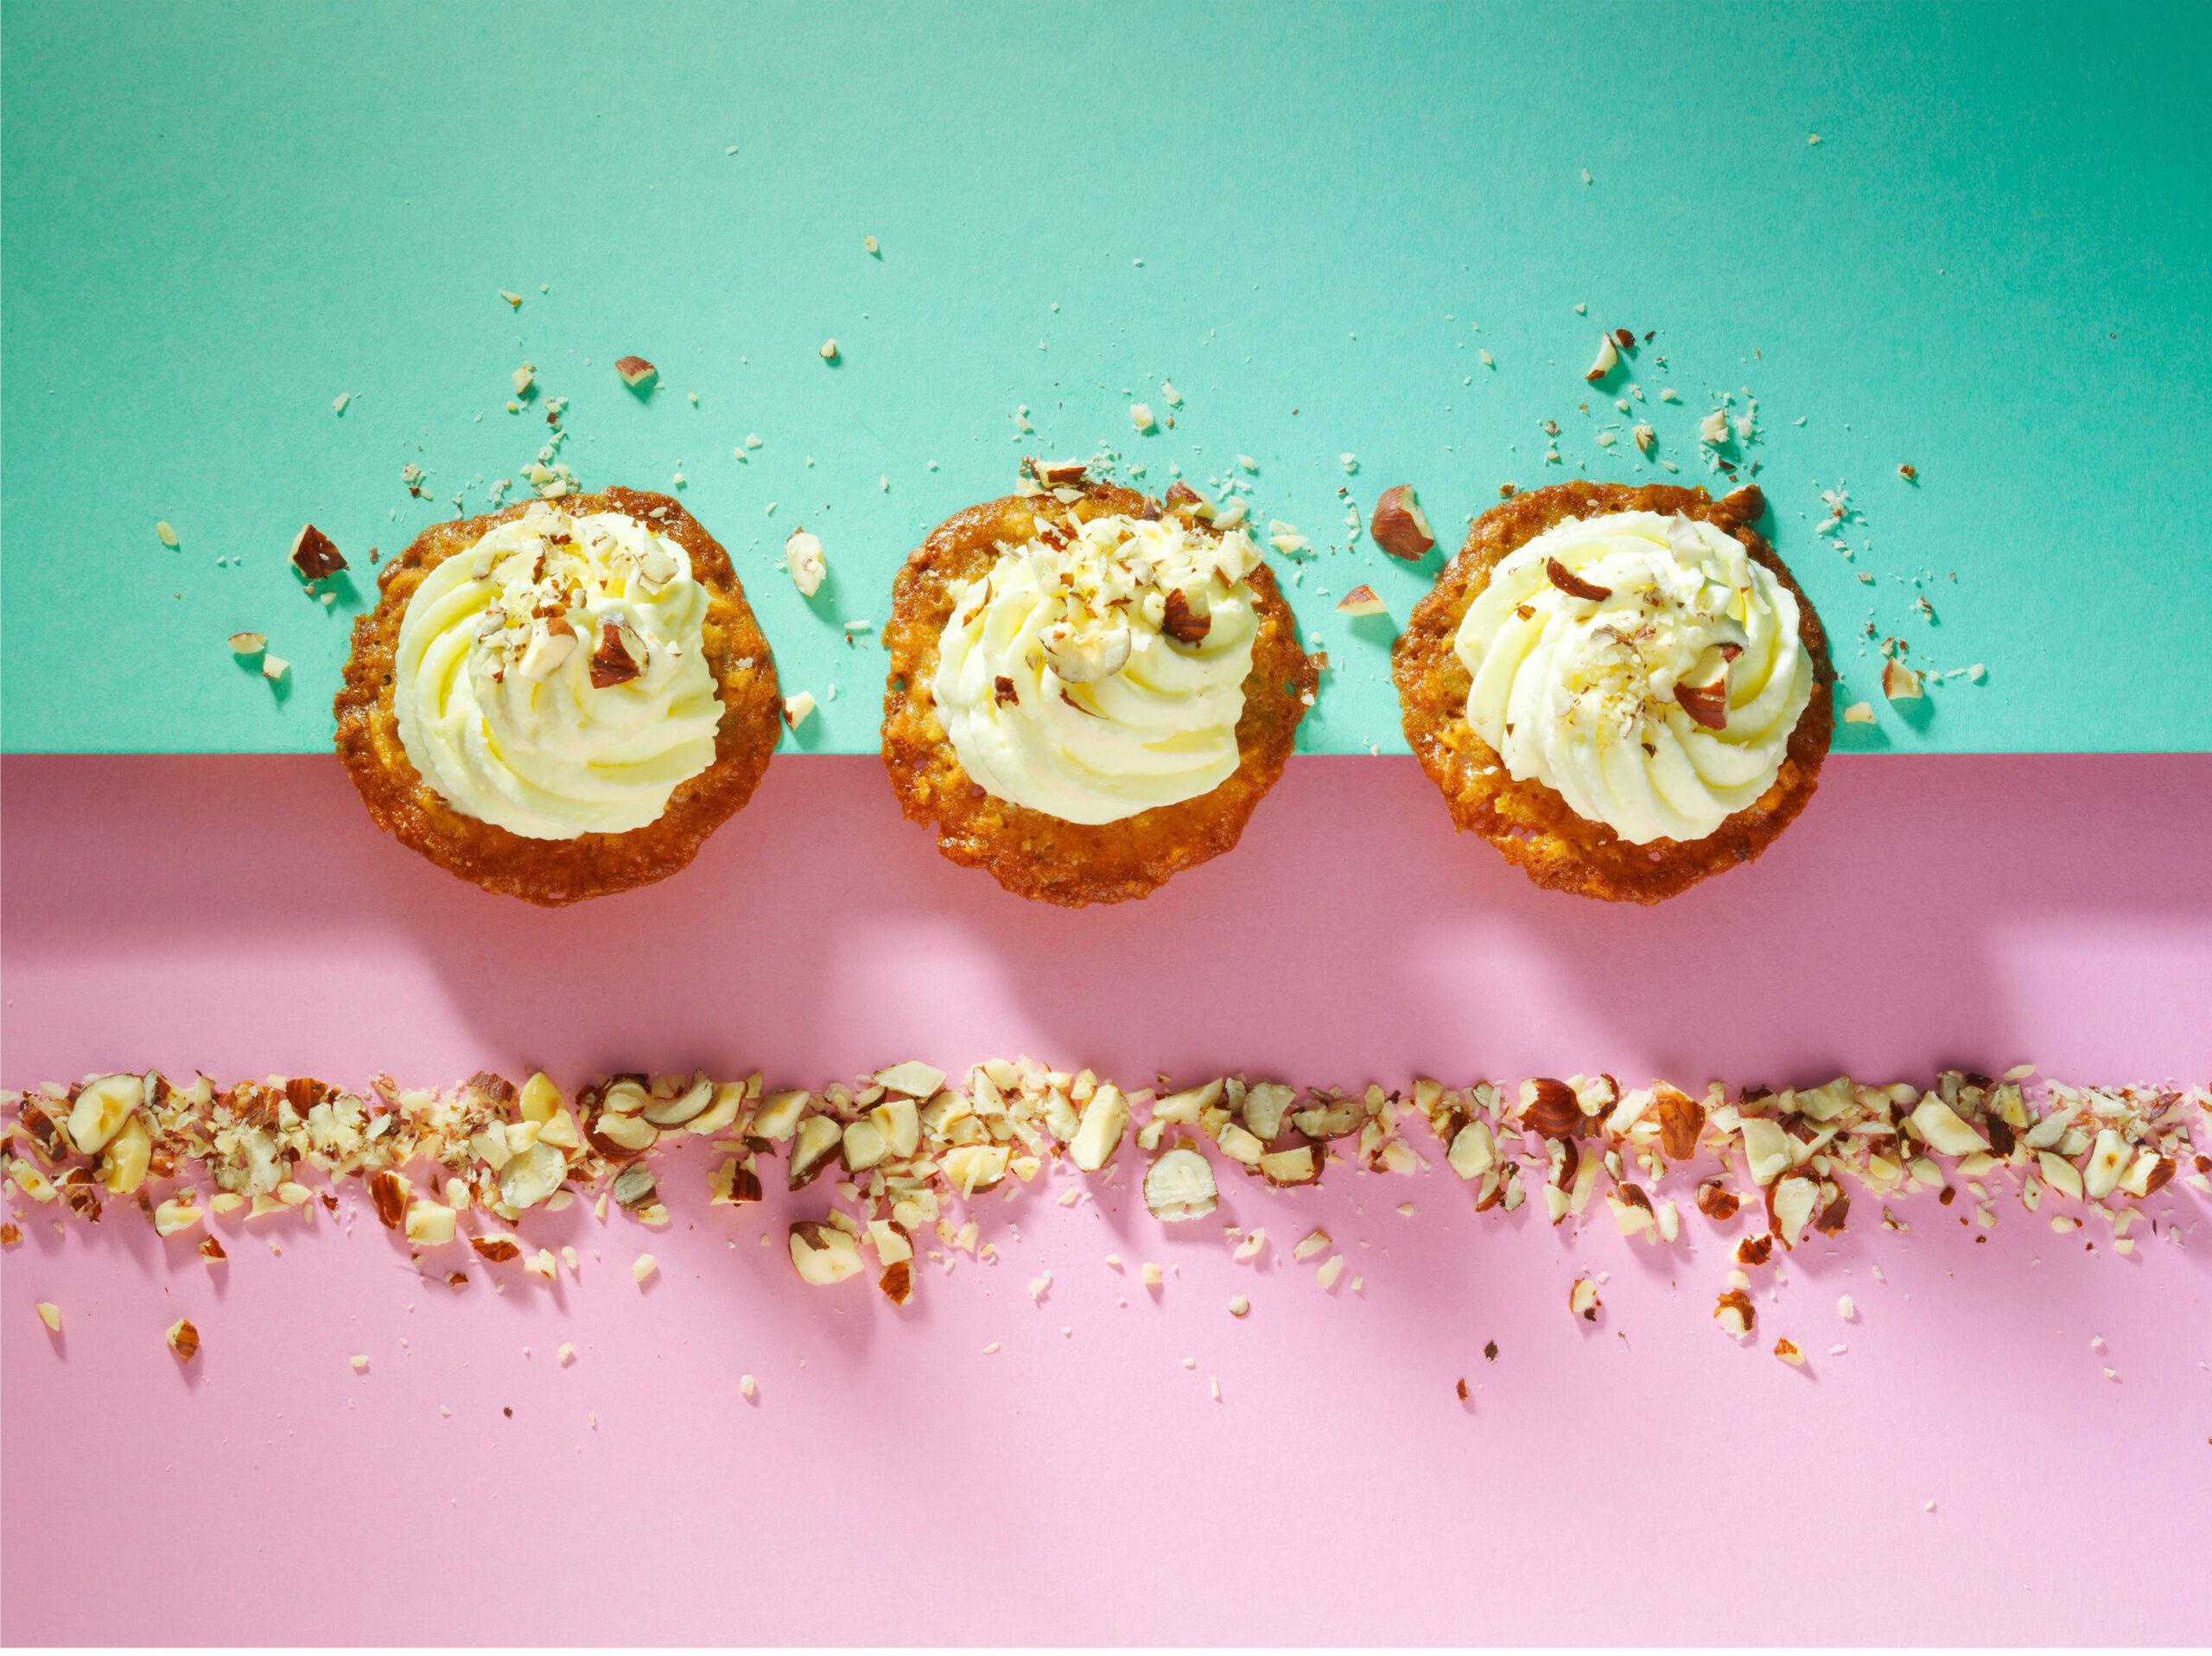 Creative food photo of SmartWhip recipe hazelnut whipped cream made by STUDIO_M Amsterdam